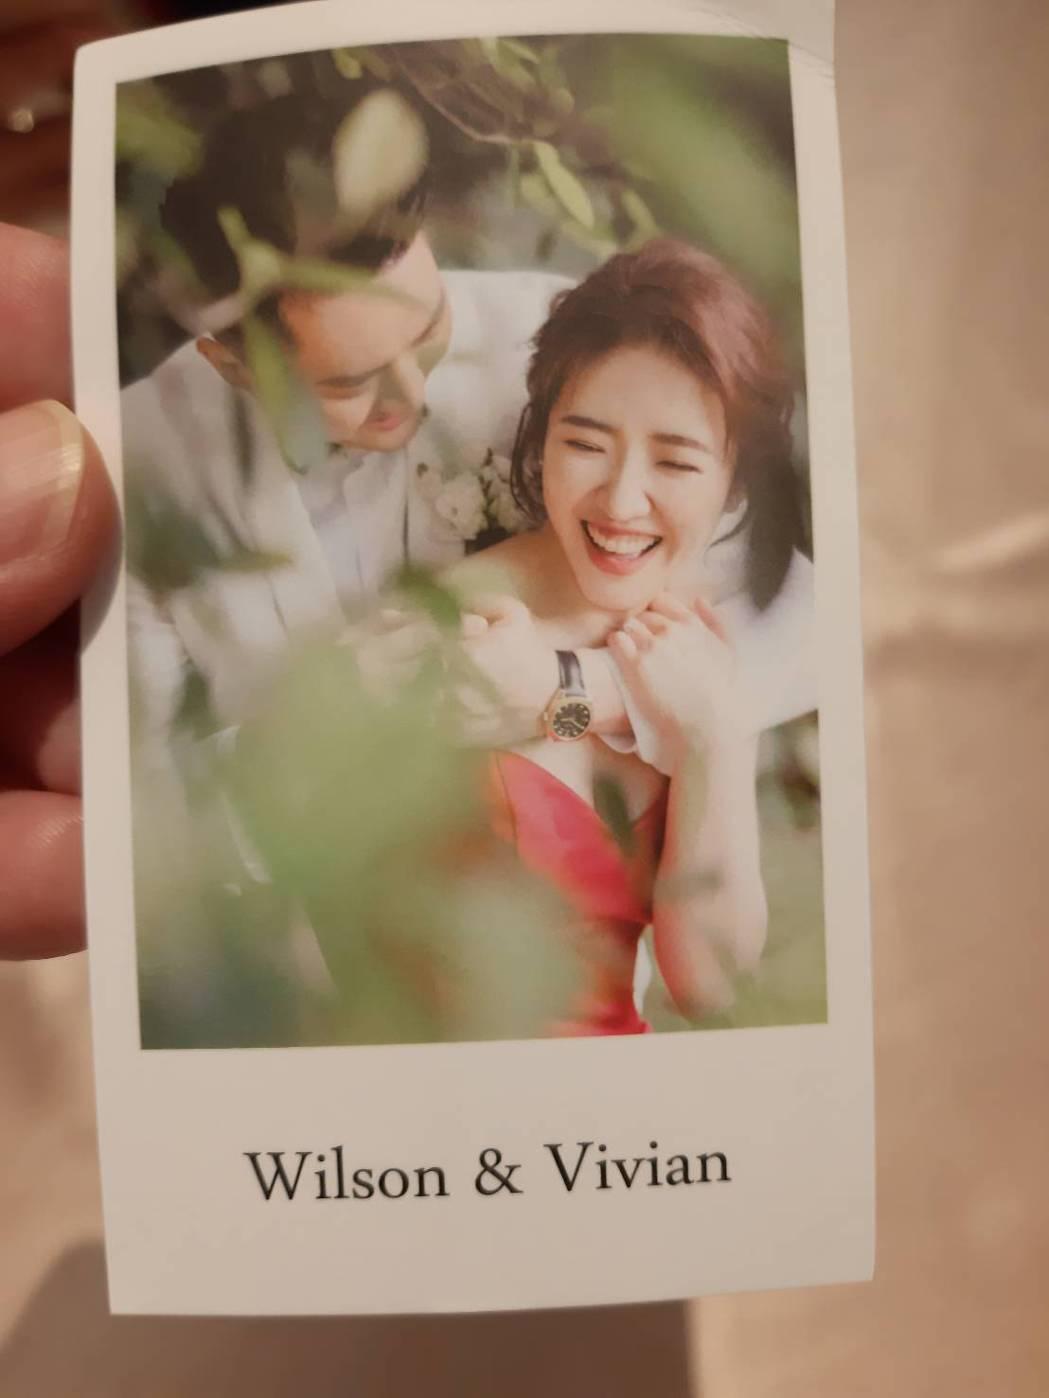 Vivian(左)和老公Wilson的婚禮小卡。記者林怡秀/攝影